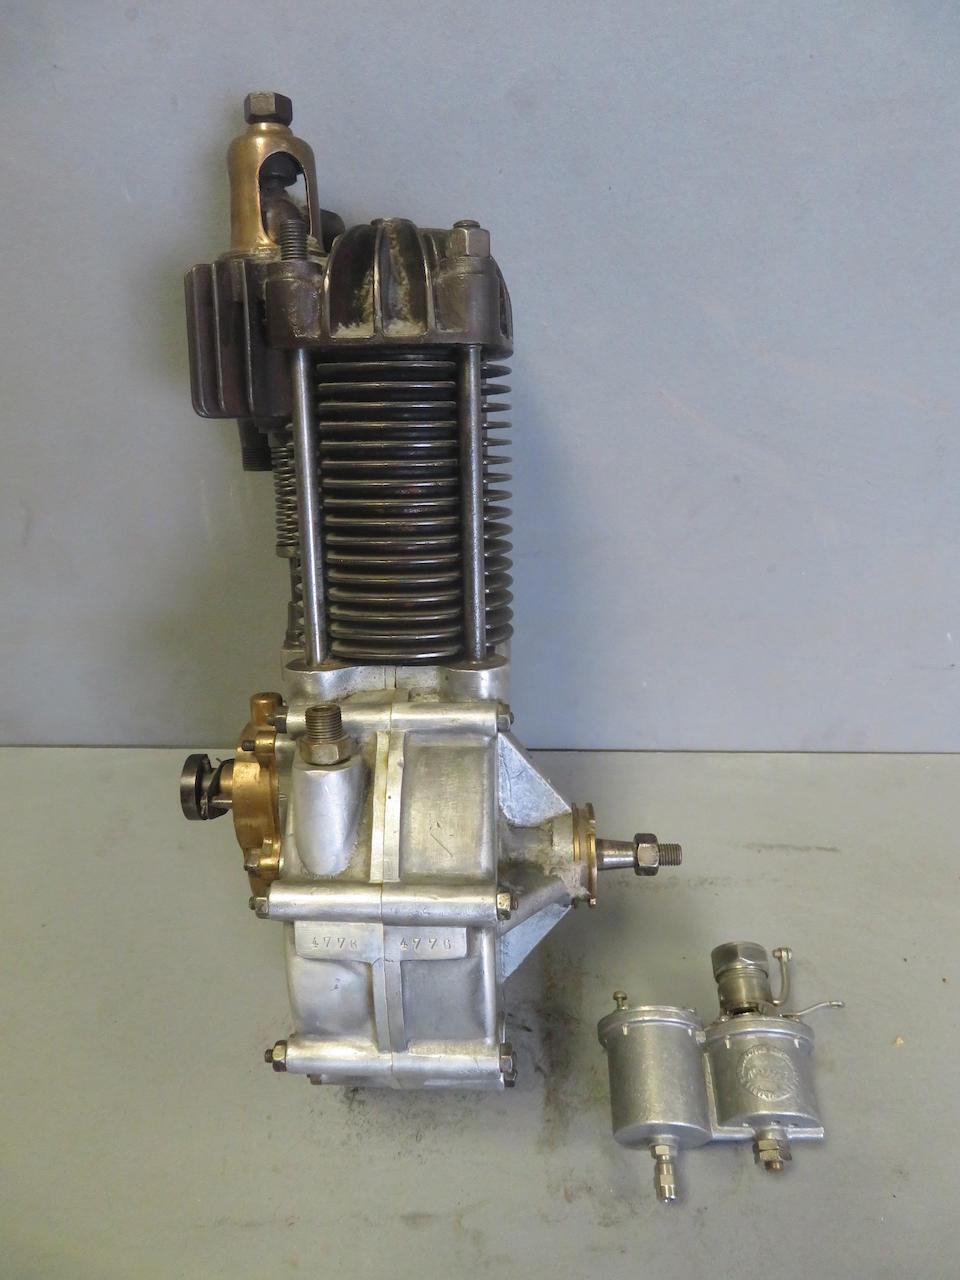 A c.1900 De Dion single cylinder engine